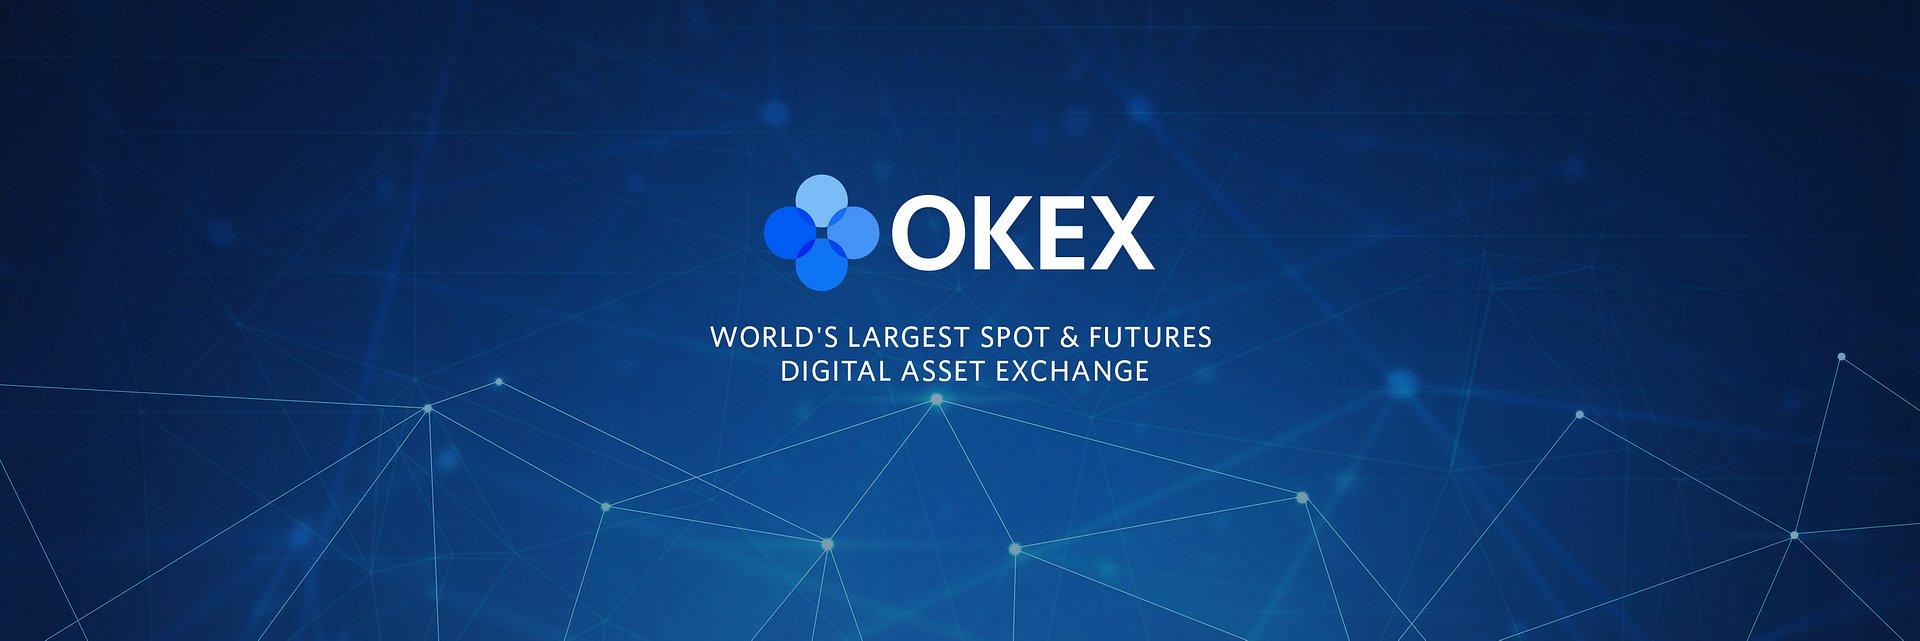 OKEx Press Room